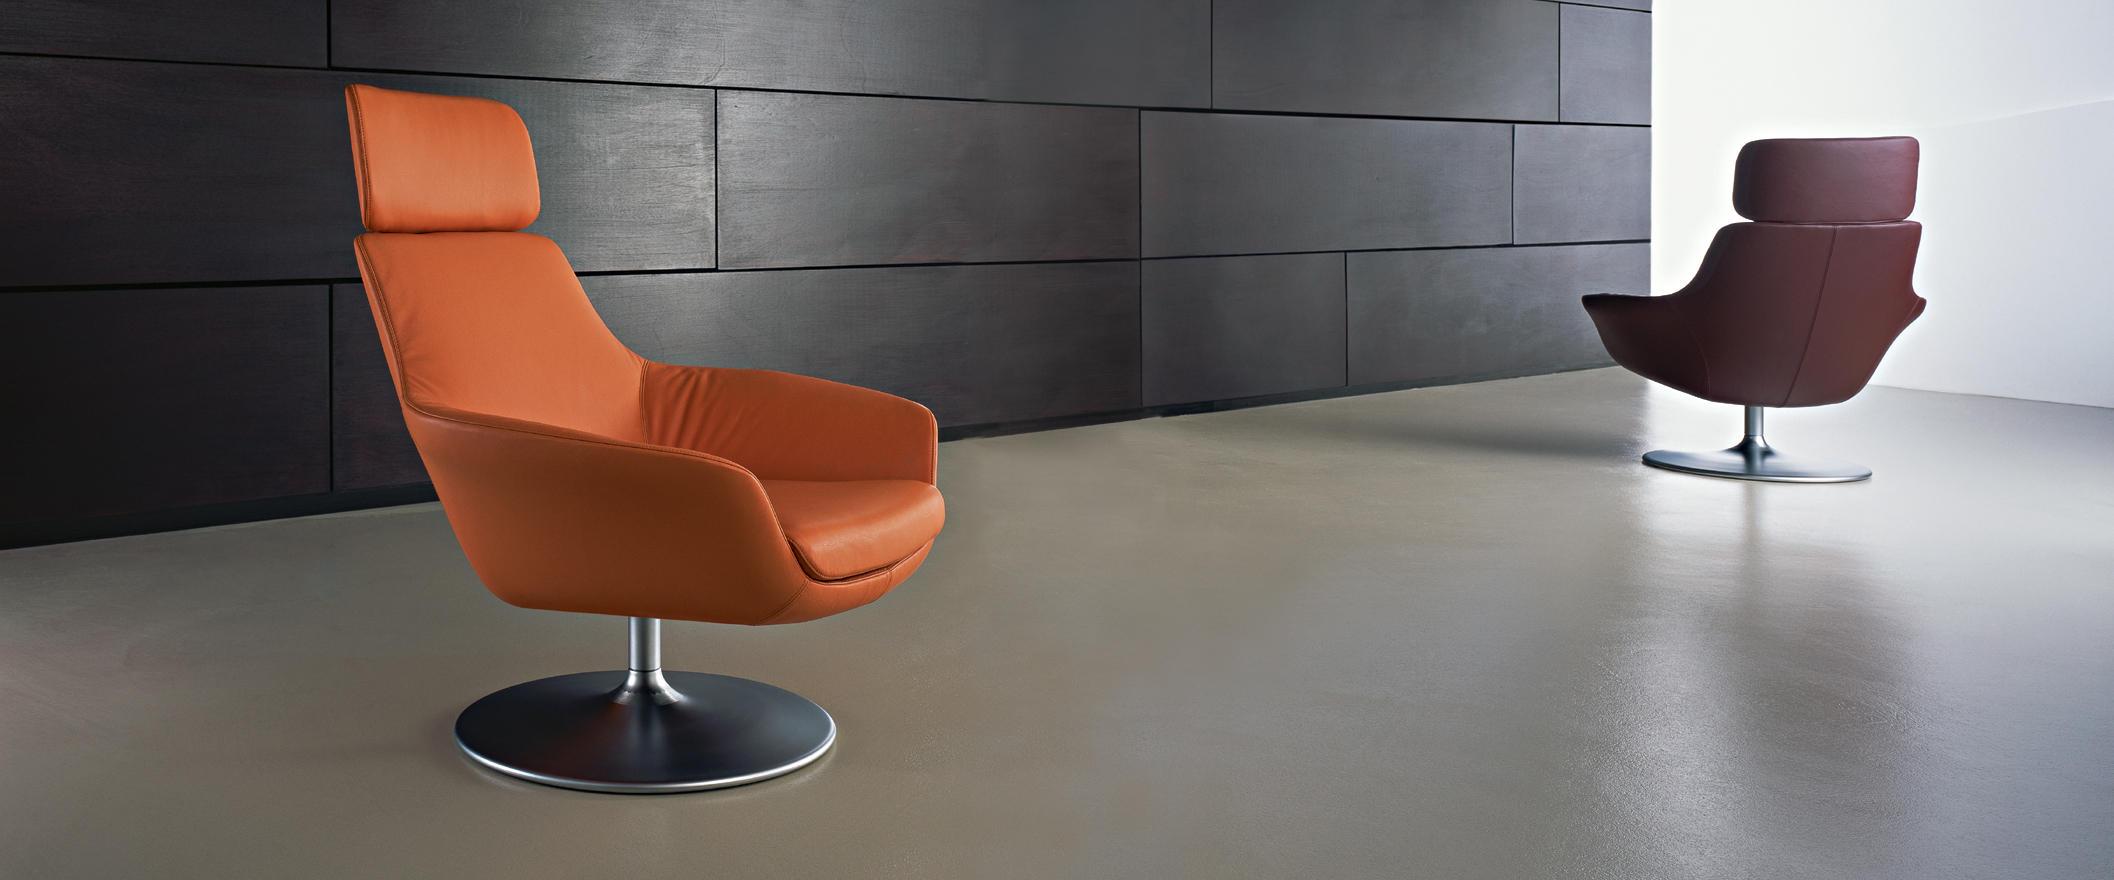 Walter Knoll Design Fauteuil.Oscar 221 Armchair Designer Furniture Architonic